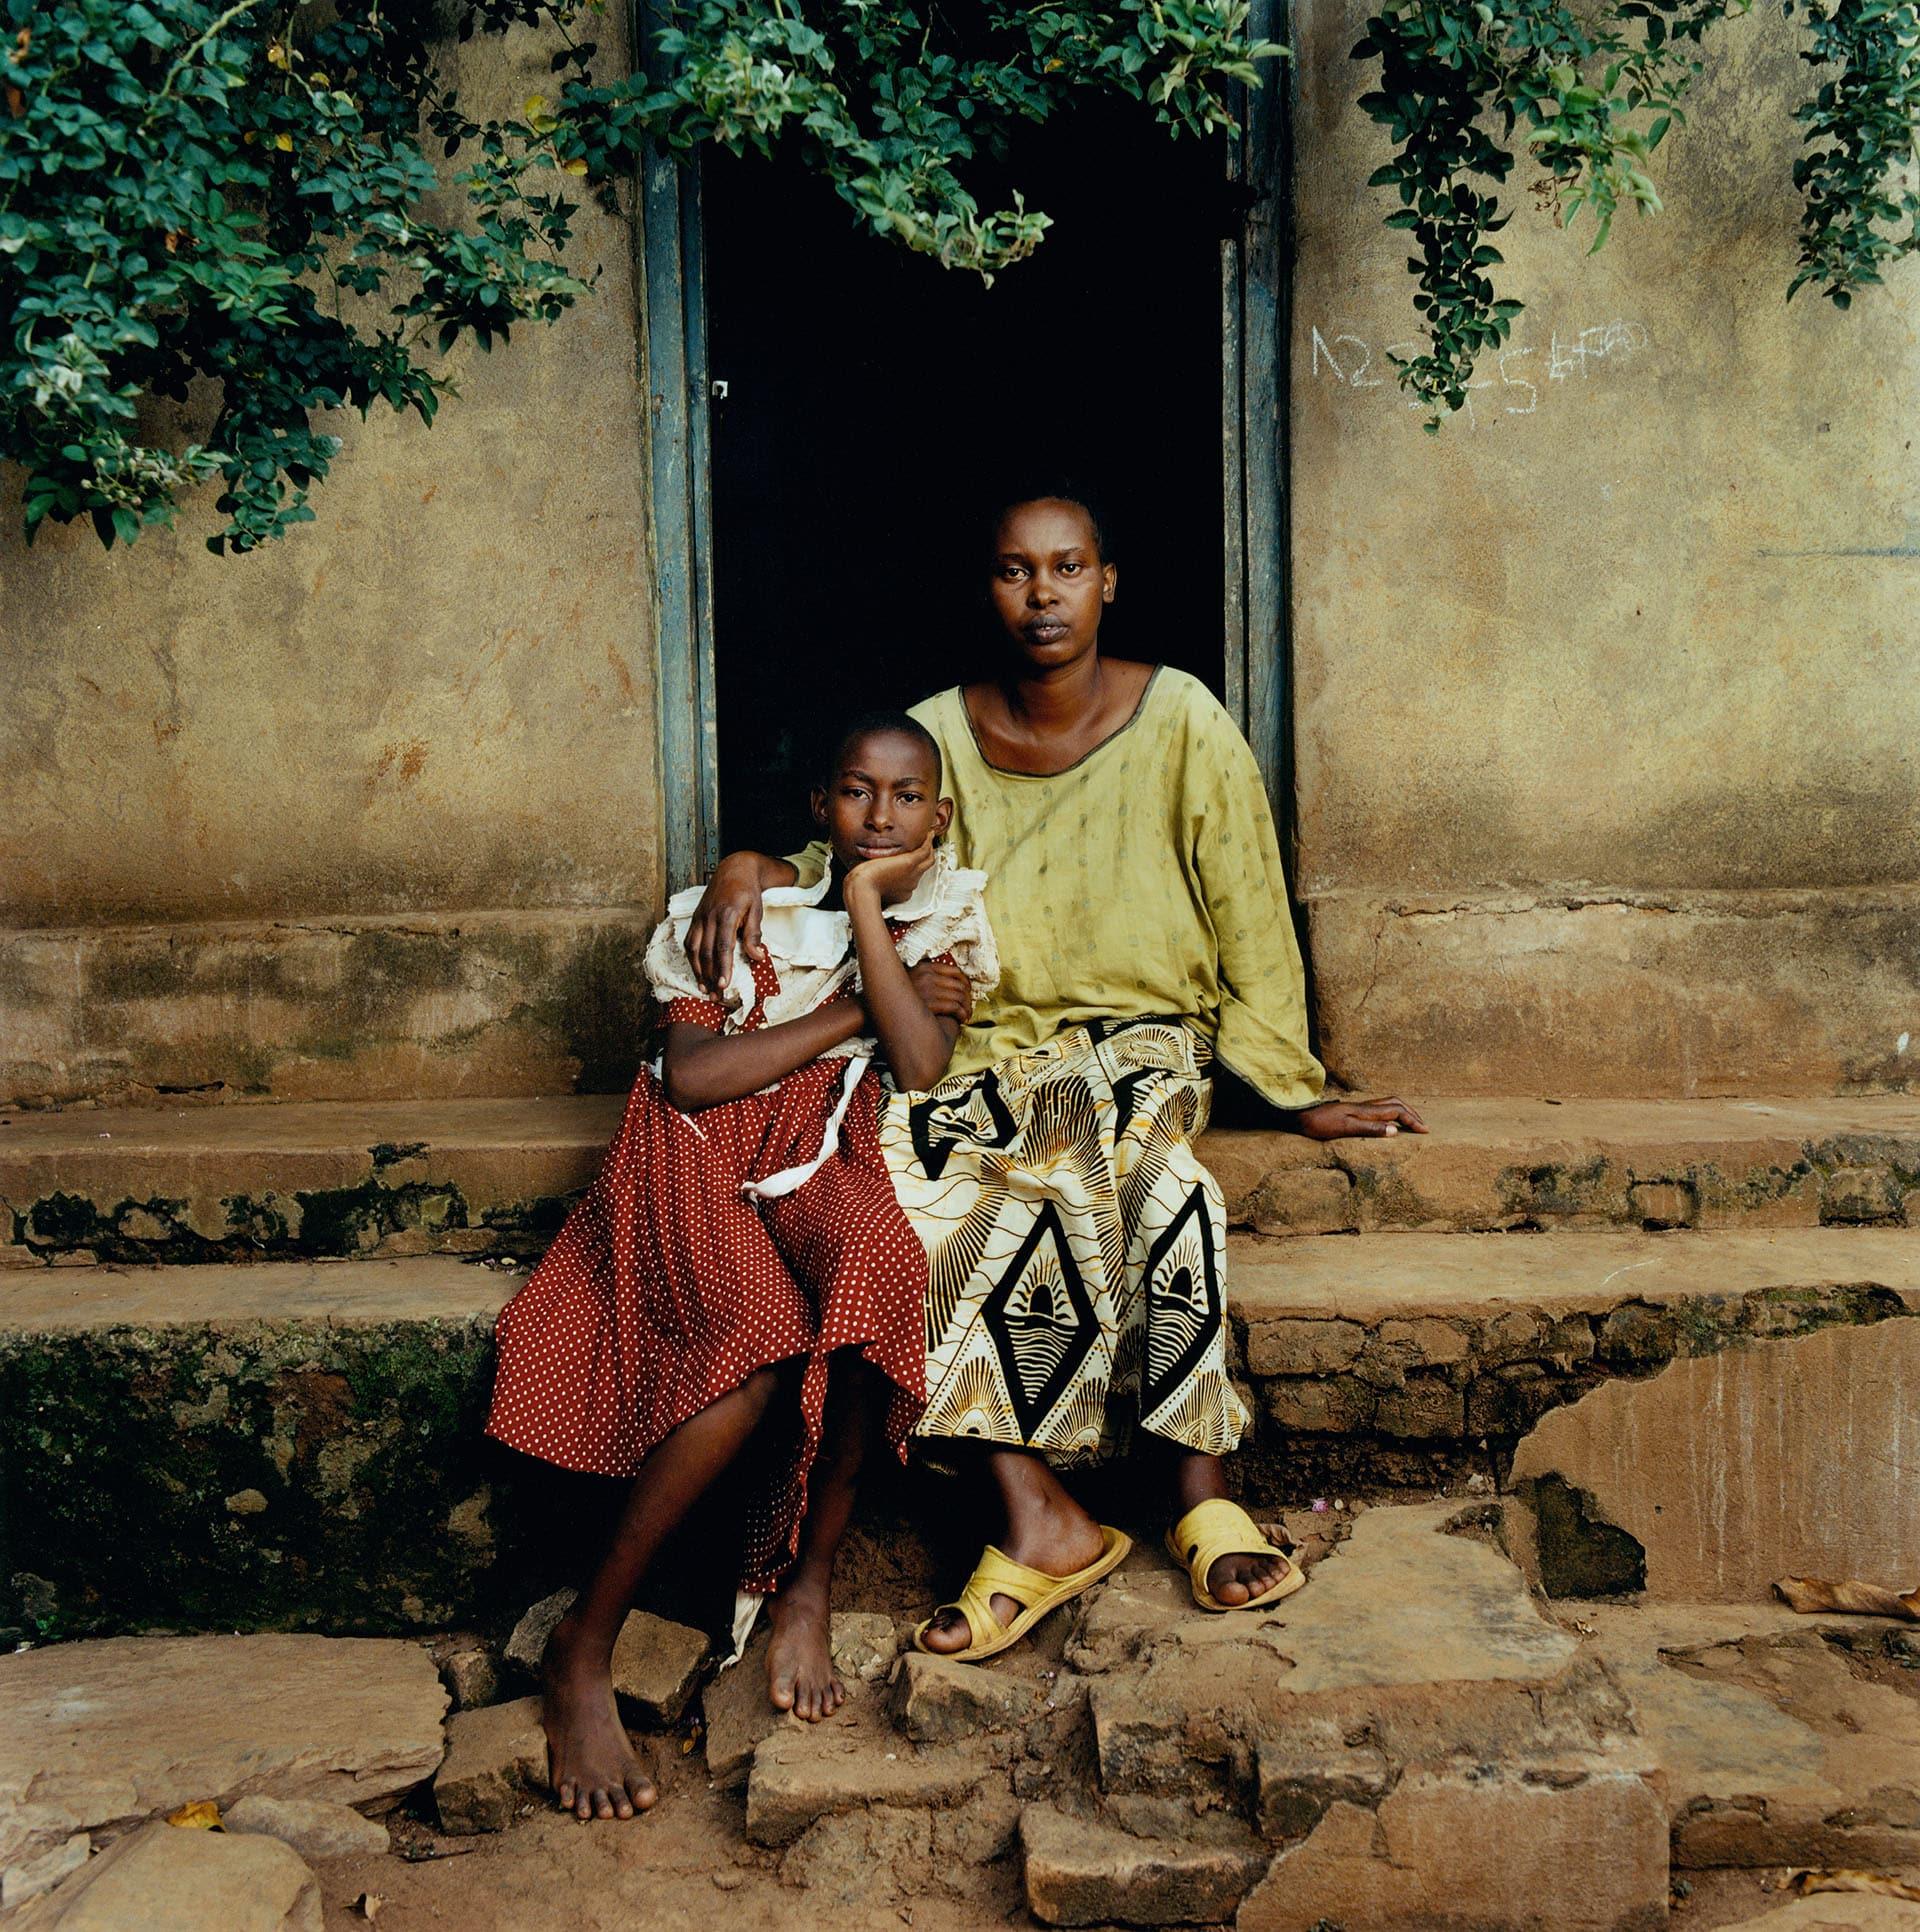 Tausi Mukakarimba (30) and her daughter Isimbi Ariguma (12).